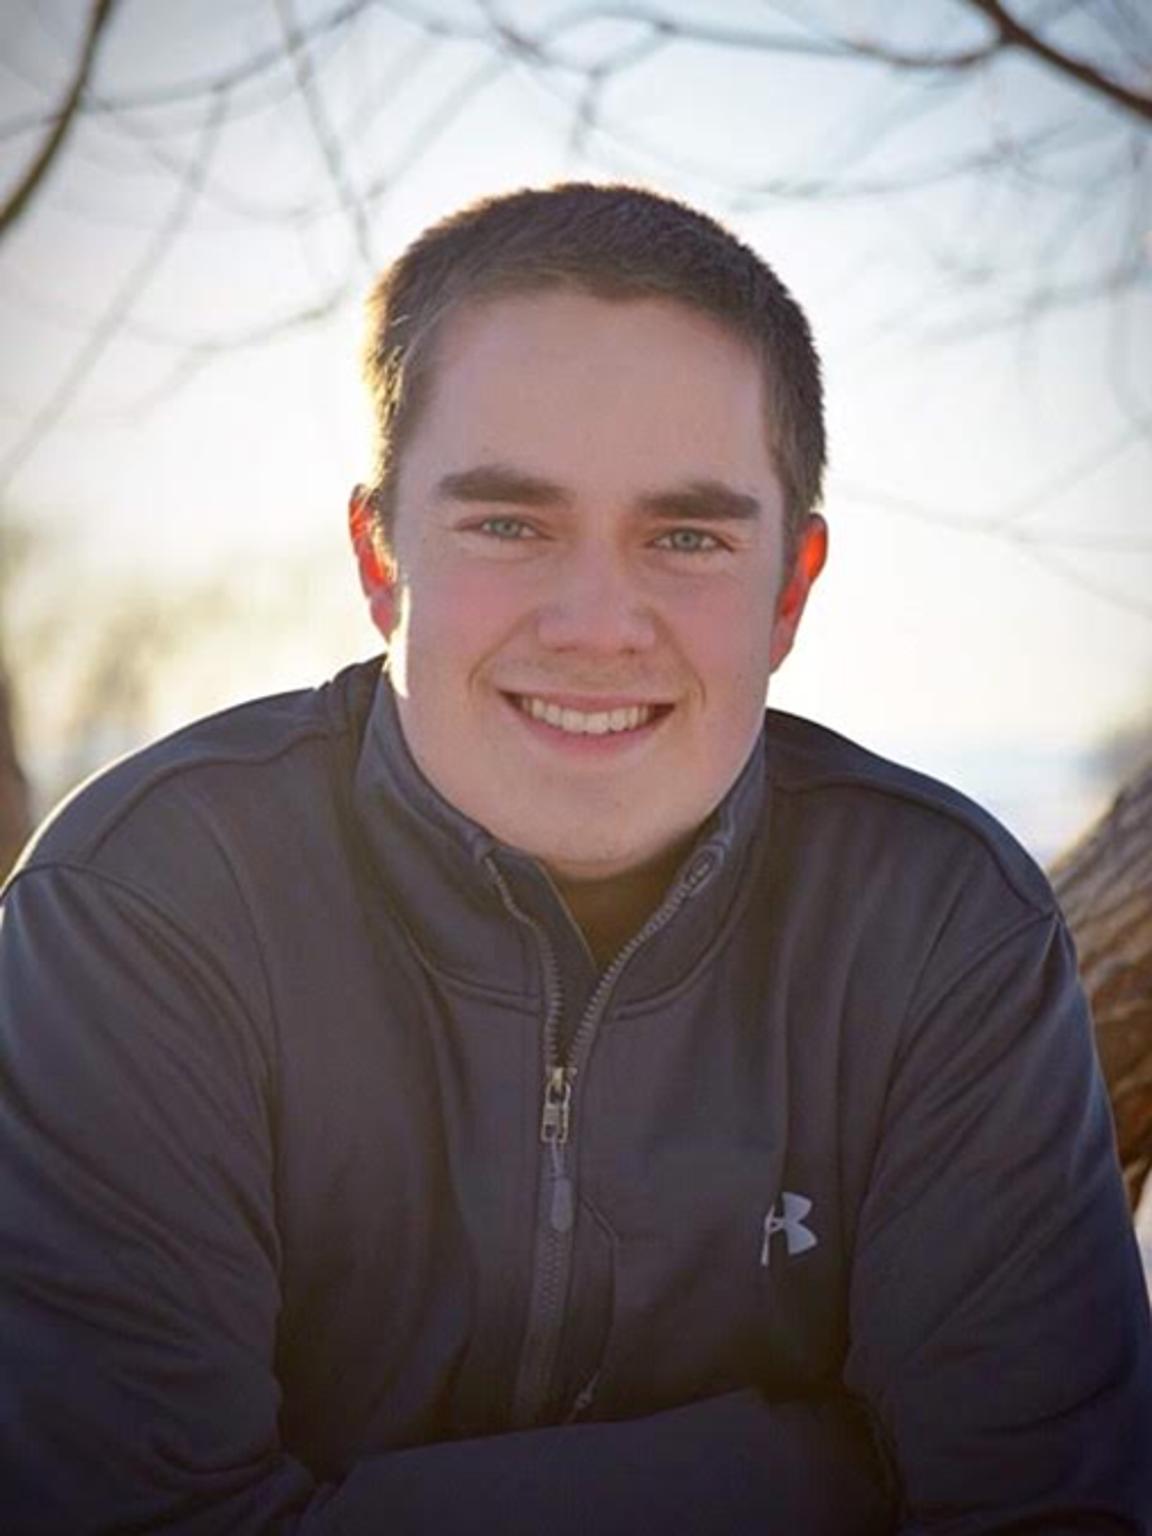 Winston Fee is a senior at Fairfield High School.